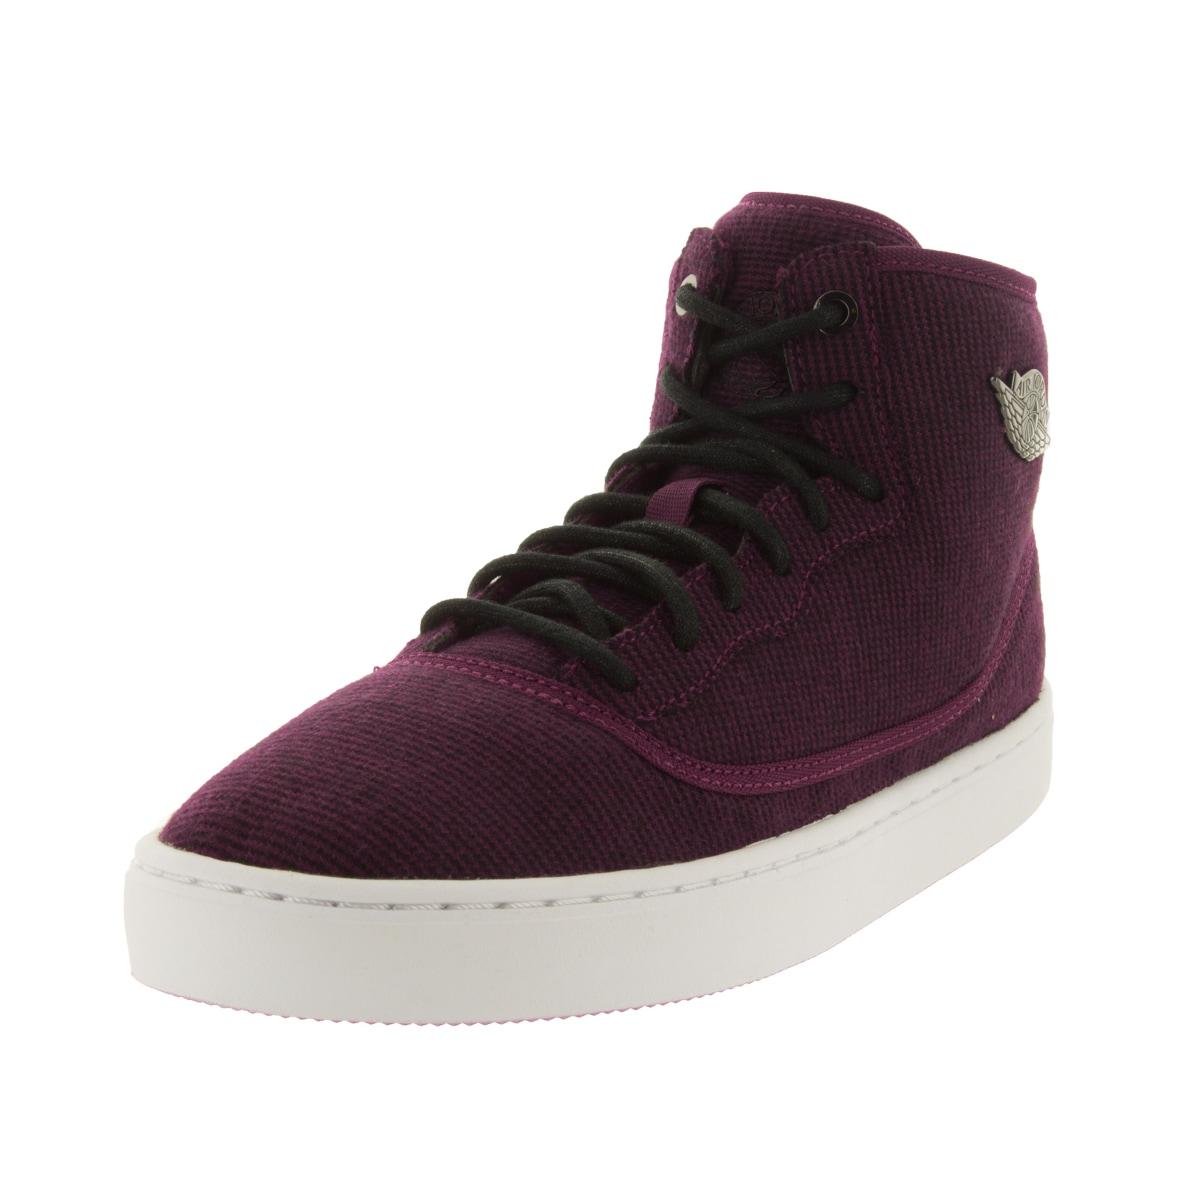 Nike Jordan Kid's Jordan Jasmine Gg Mulberry/Black/Fchs G...